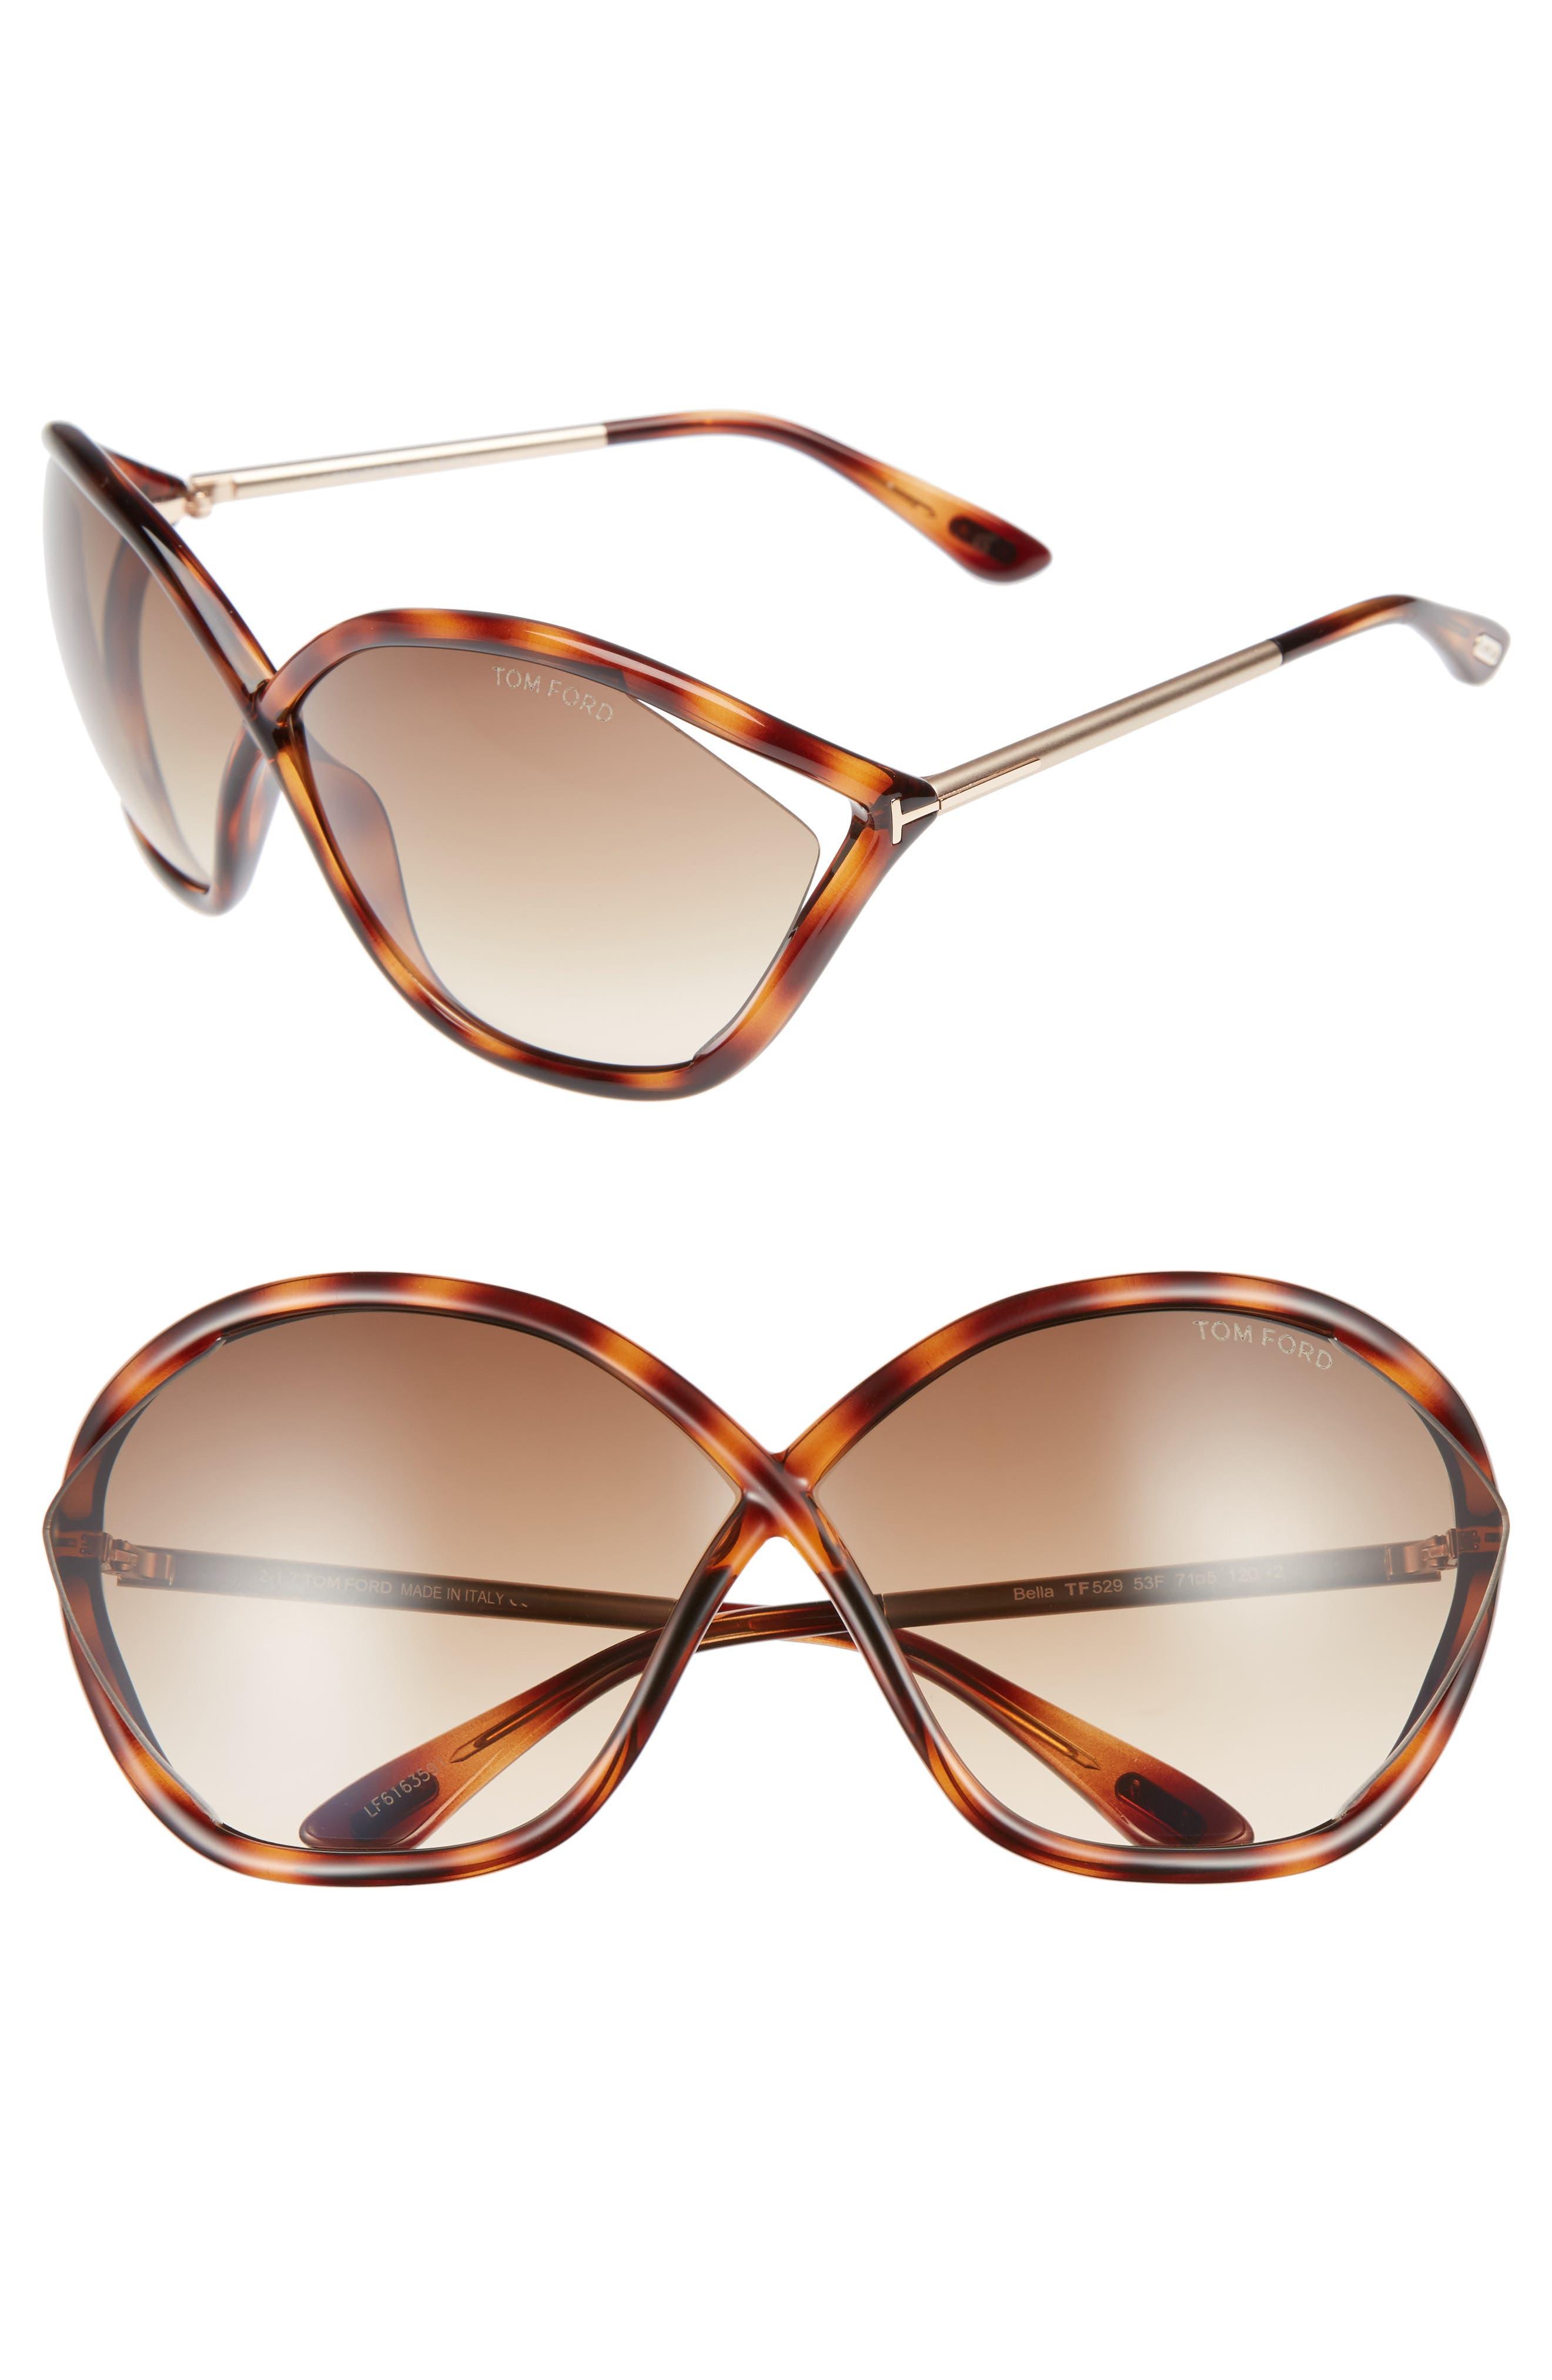 Tom Ford Bella 71mm Gradient Lens Sunglasses